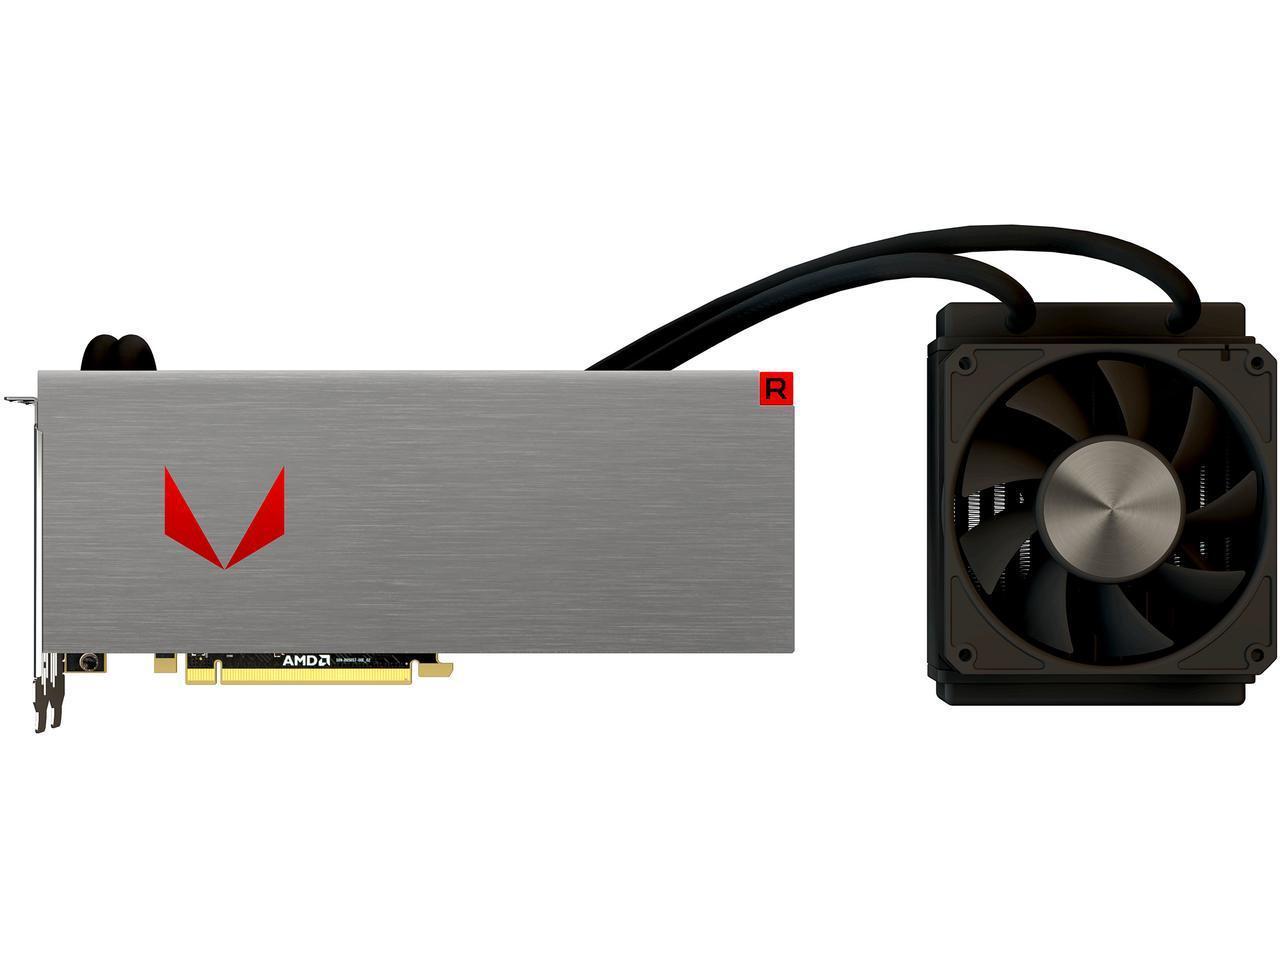 Liquid Cooled PowerColor Radeon RX Vega 64 8GB HBM2 Video Card + 3-Game Preorder Gift $499.99+FS